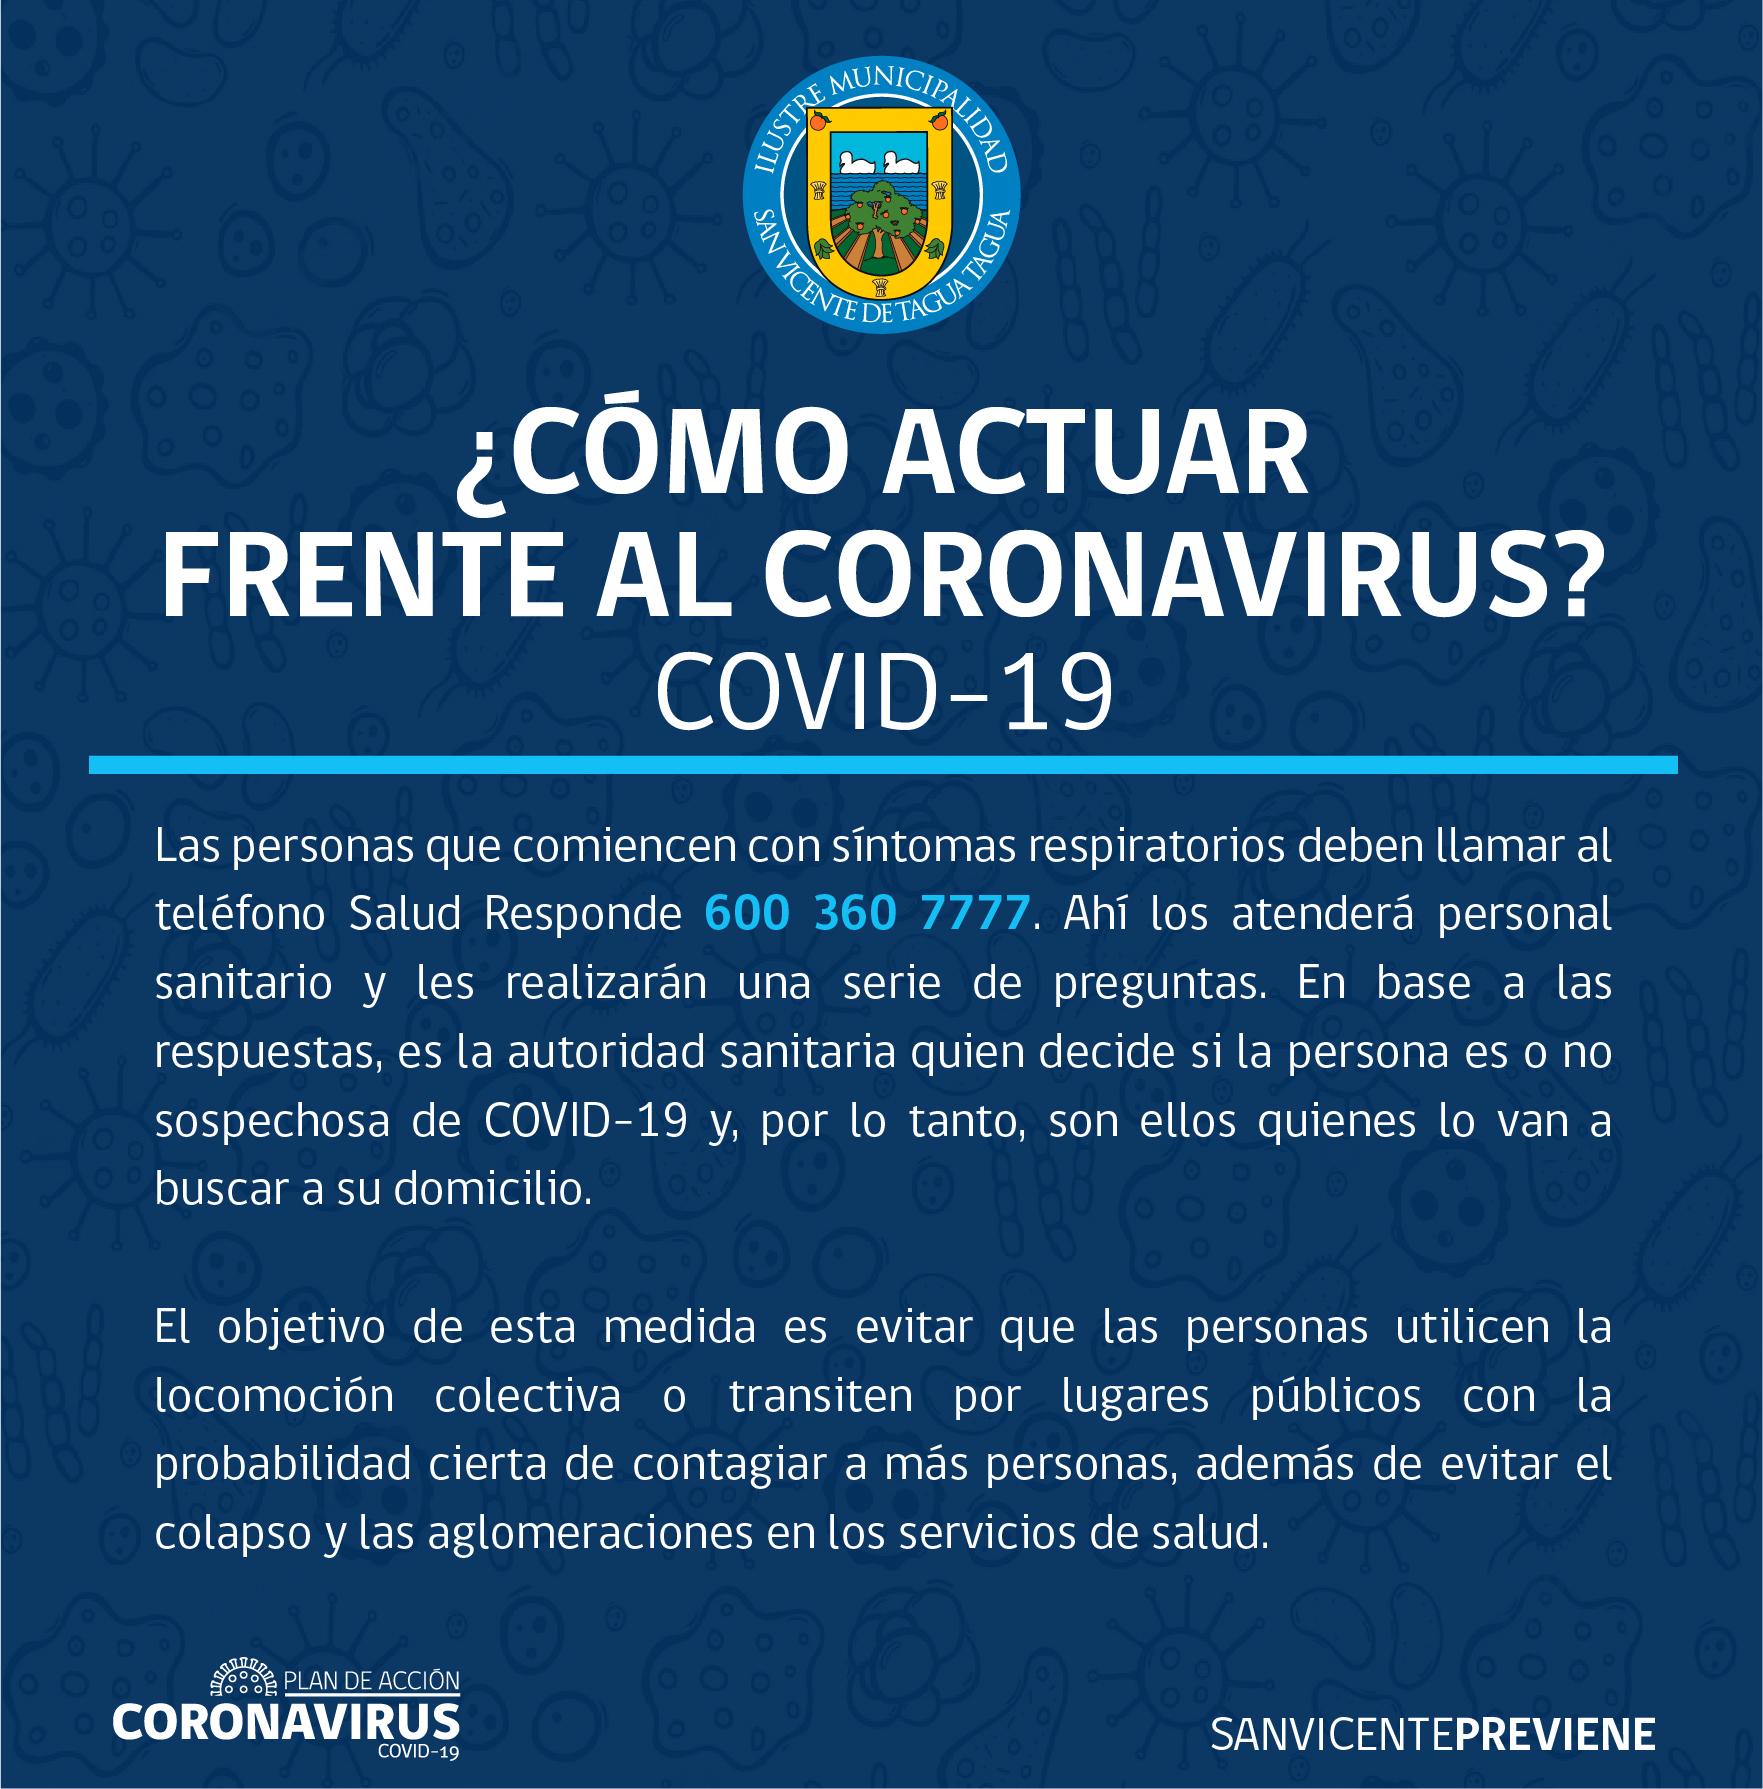 ¿CÓMO ACTUAR FRENTE AL CORONAVIRUS COVID-19?